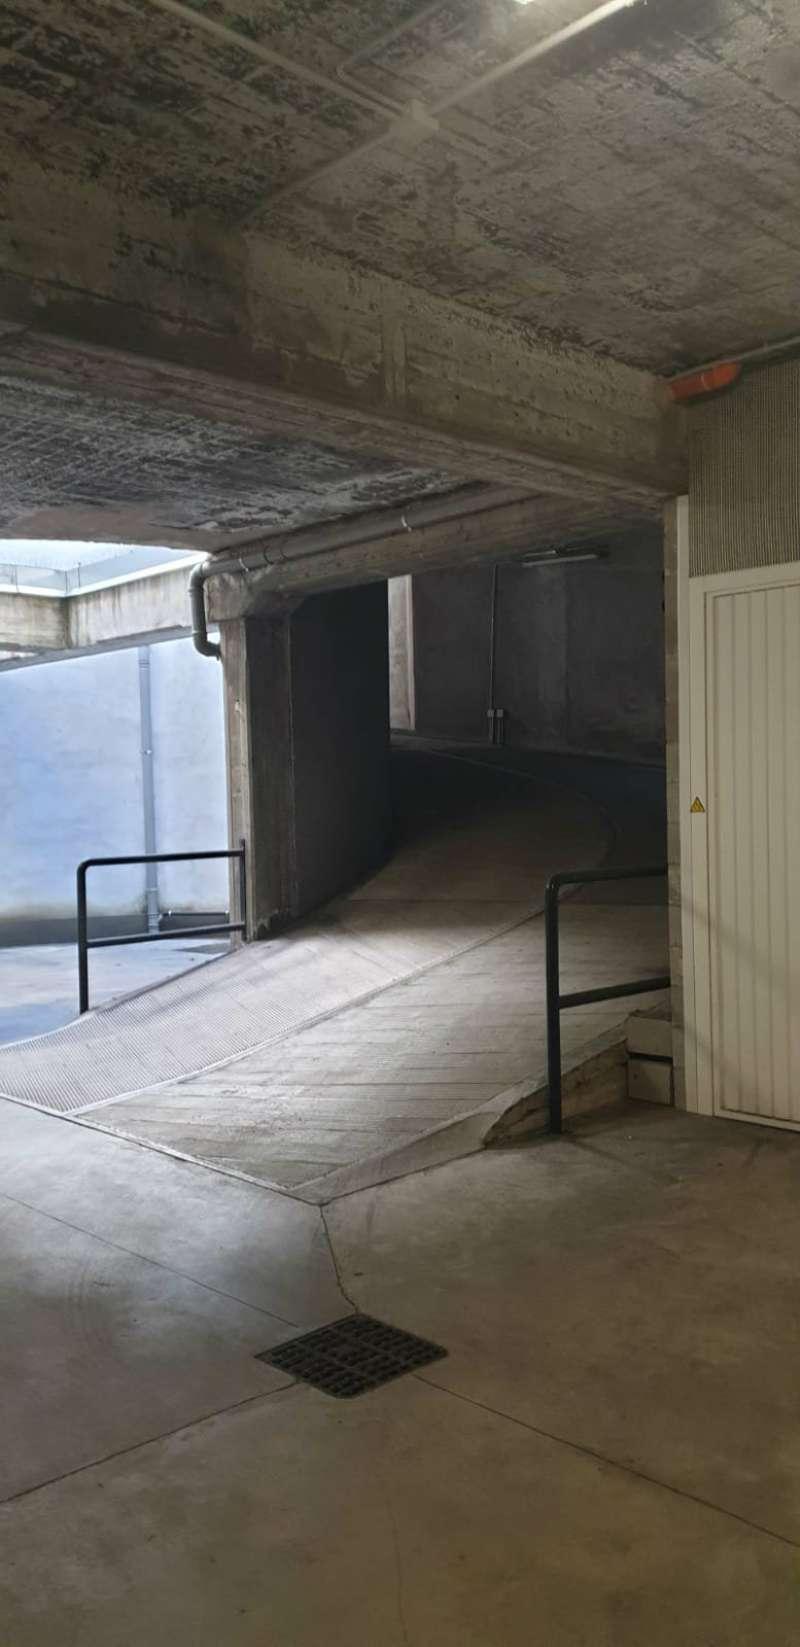 Foto 1 di Box / Garage via Bava 48, Torino (zona Vanchiglia, Regio Parco)